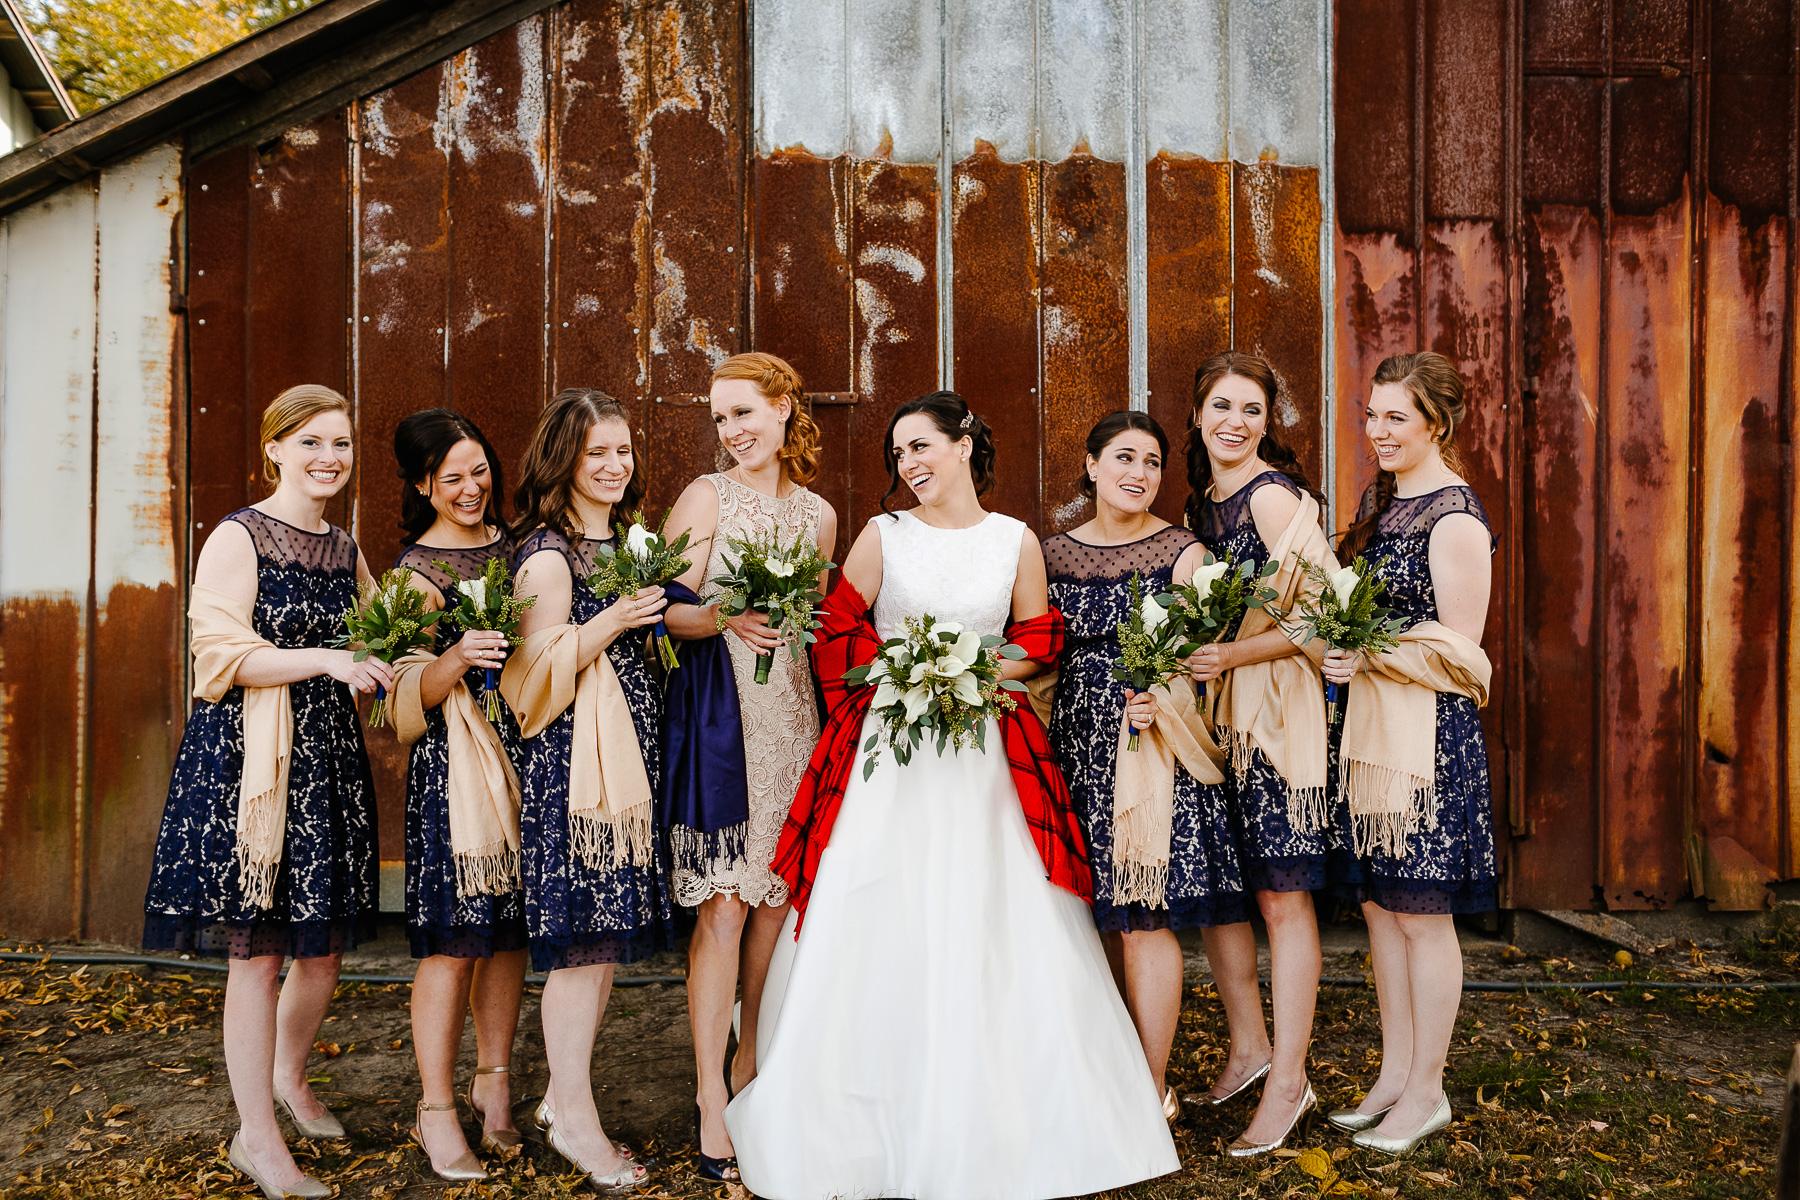 63-Laurita Winery Wedding New Jersey Wedding Photographer Laurita Winery Weddings Longbrook Photography.jpg